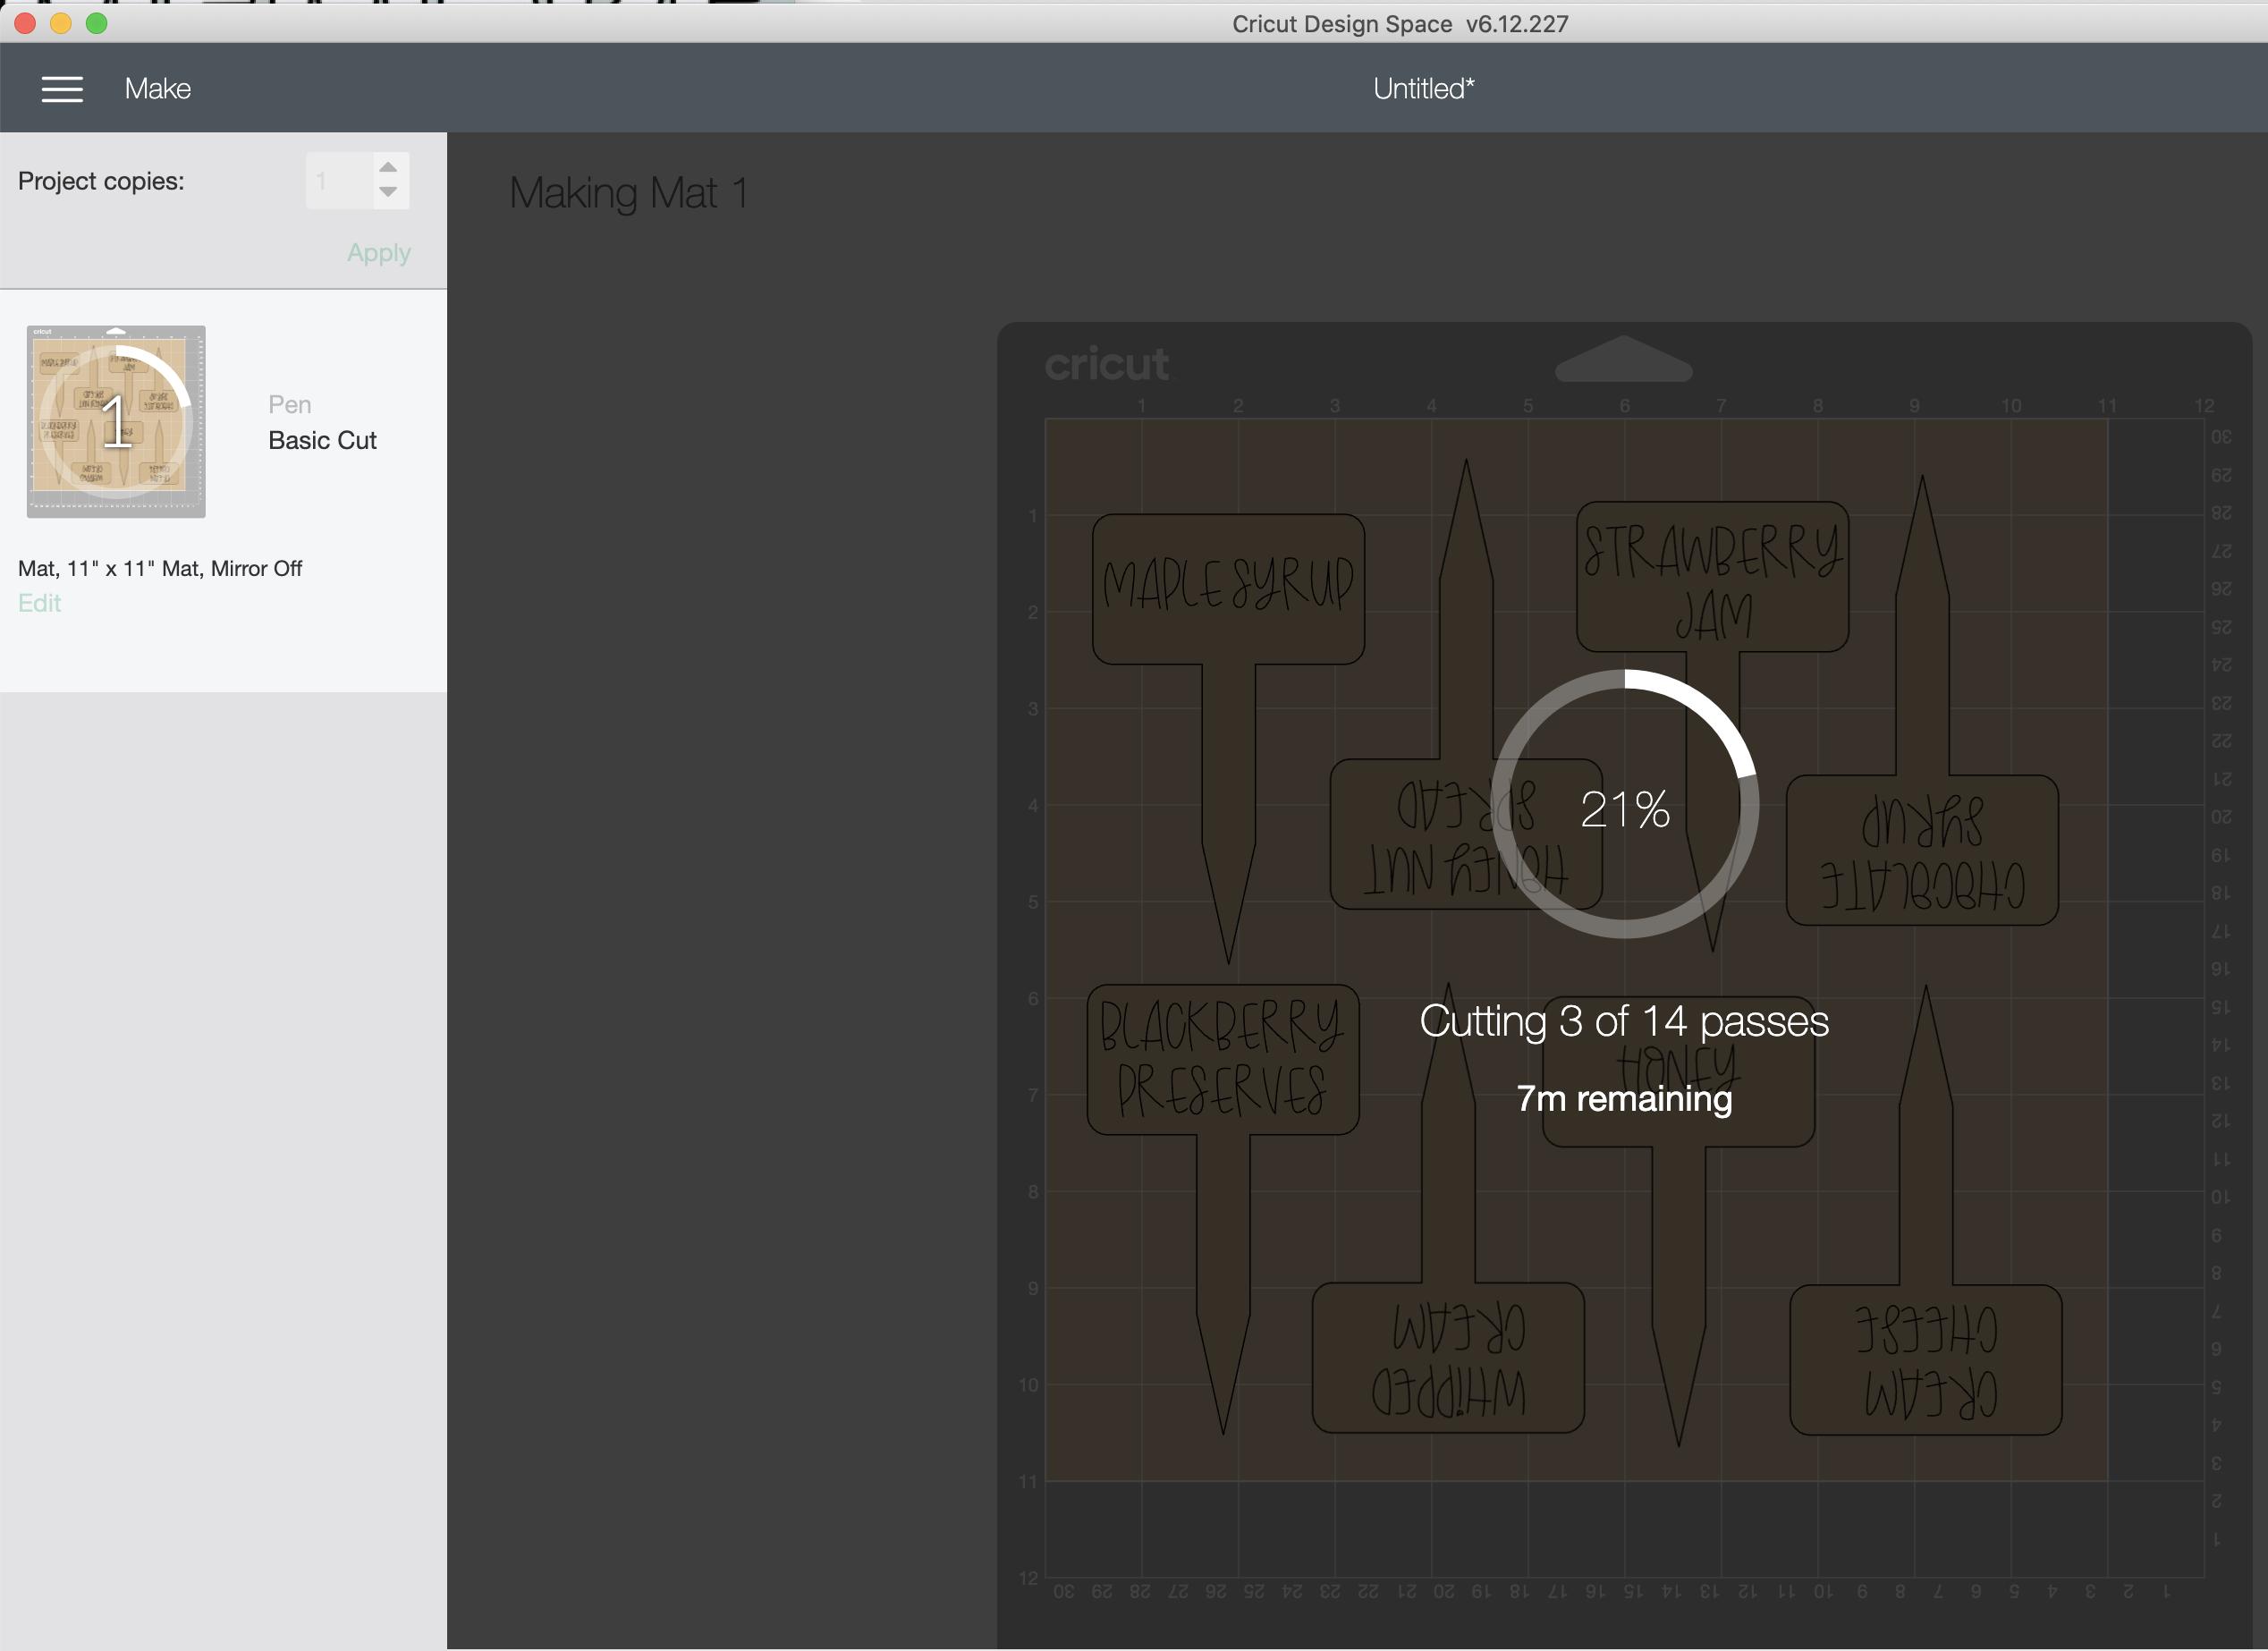 Cricut Design Space screenshot showing how many cuts